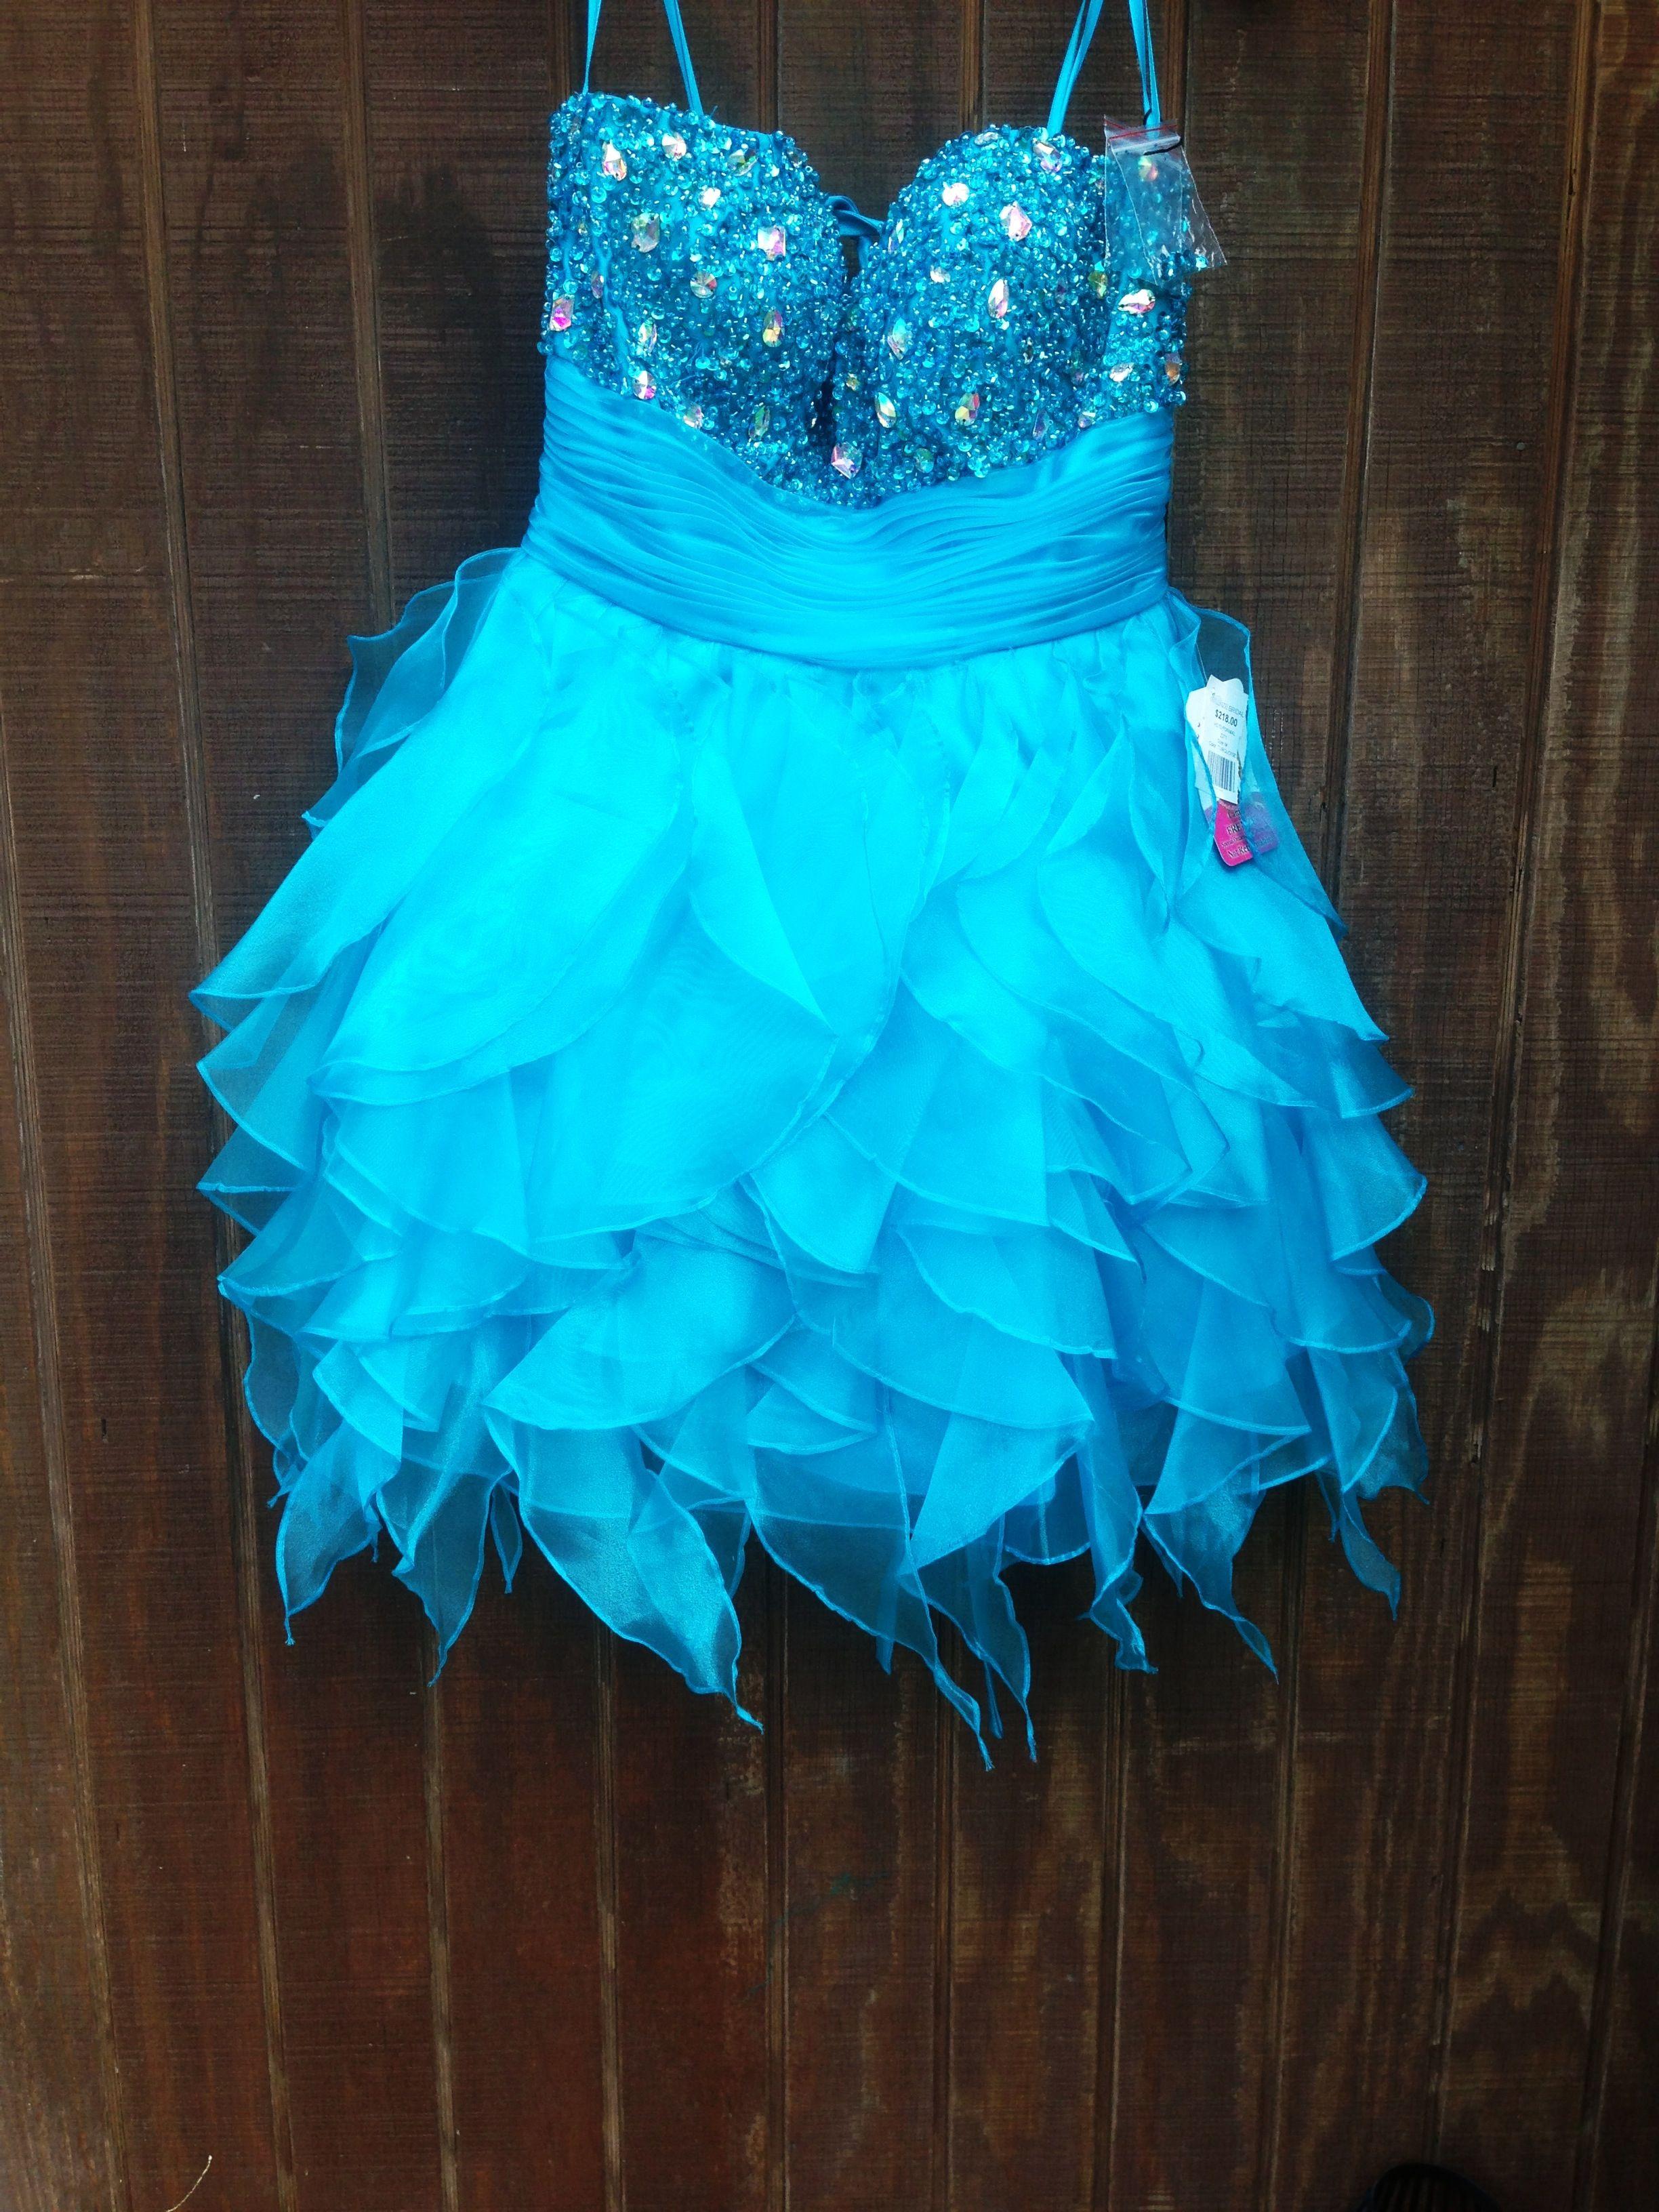 Blue semi formal dress. dazzling dress rentals in riverton Utah ...